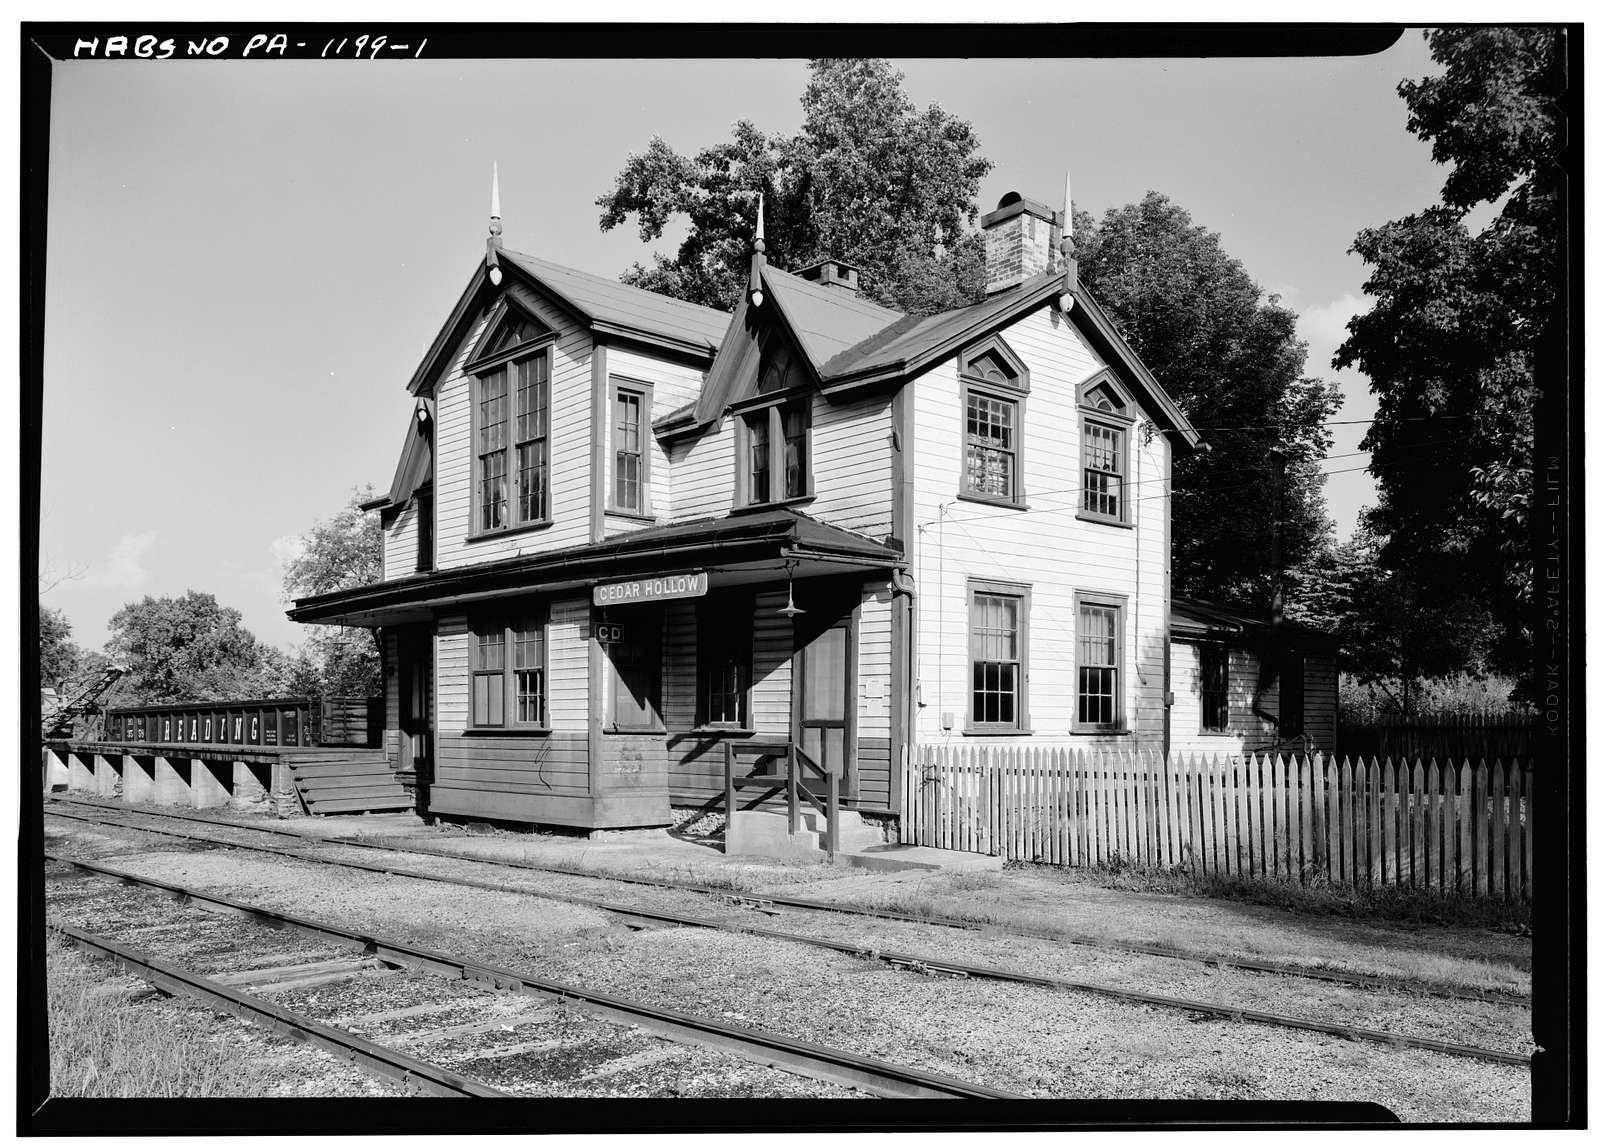 Cedar Hollow Railroad Station, Cedar Hollow Road (Tredyffrin Township), Paoli, Chester County, PA